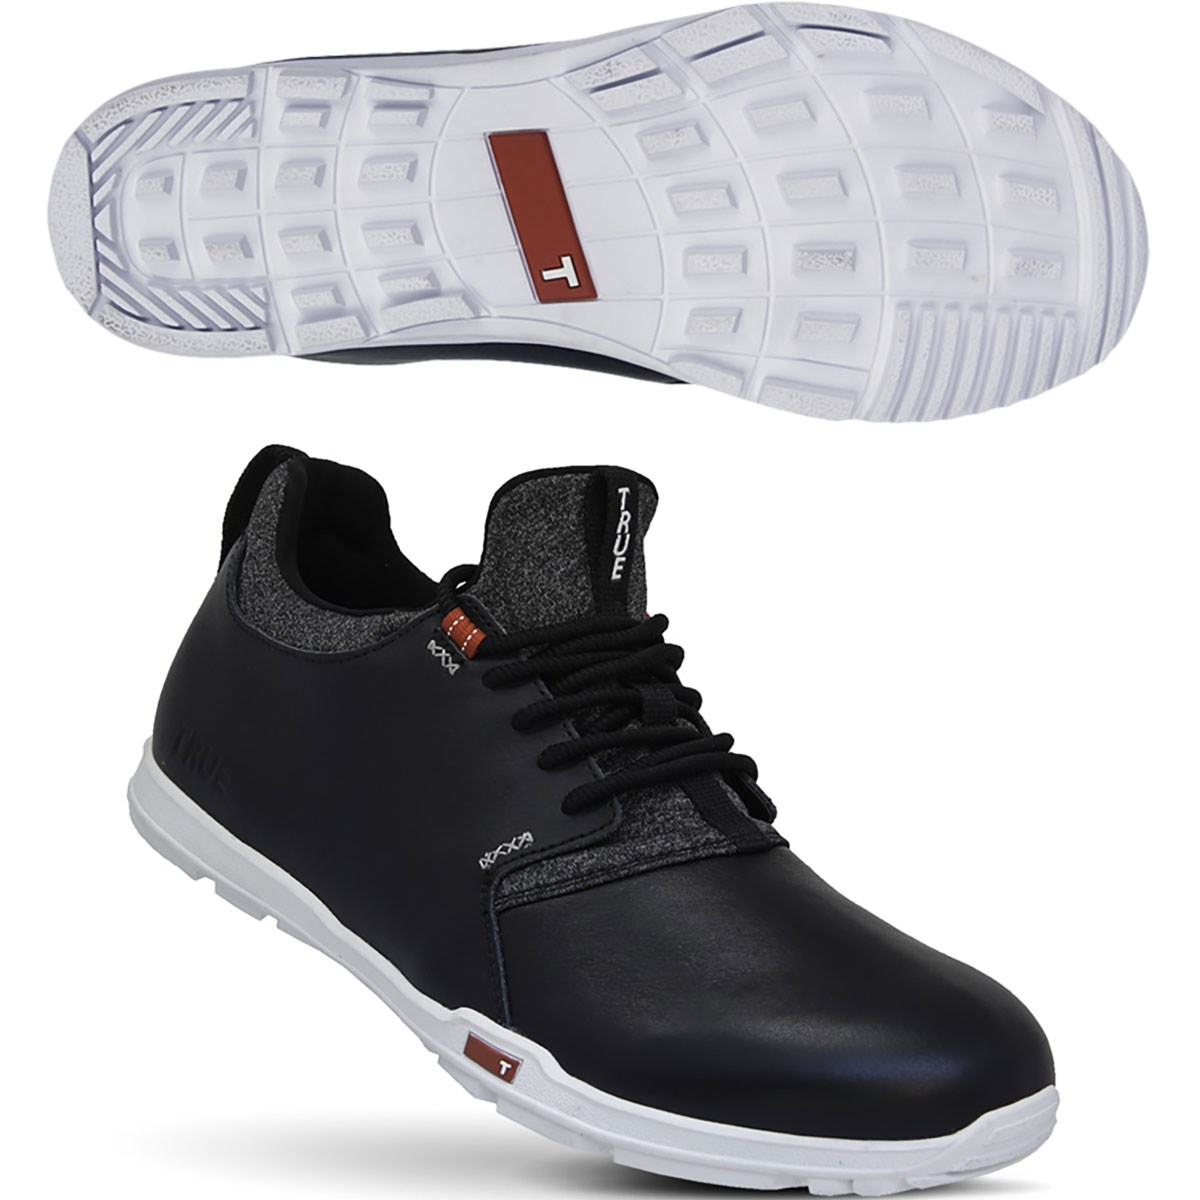 TRUE linkswear トゥルーリンクスウェア ORIGINAL シューズ 26cm ブラック 10